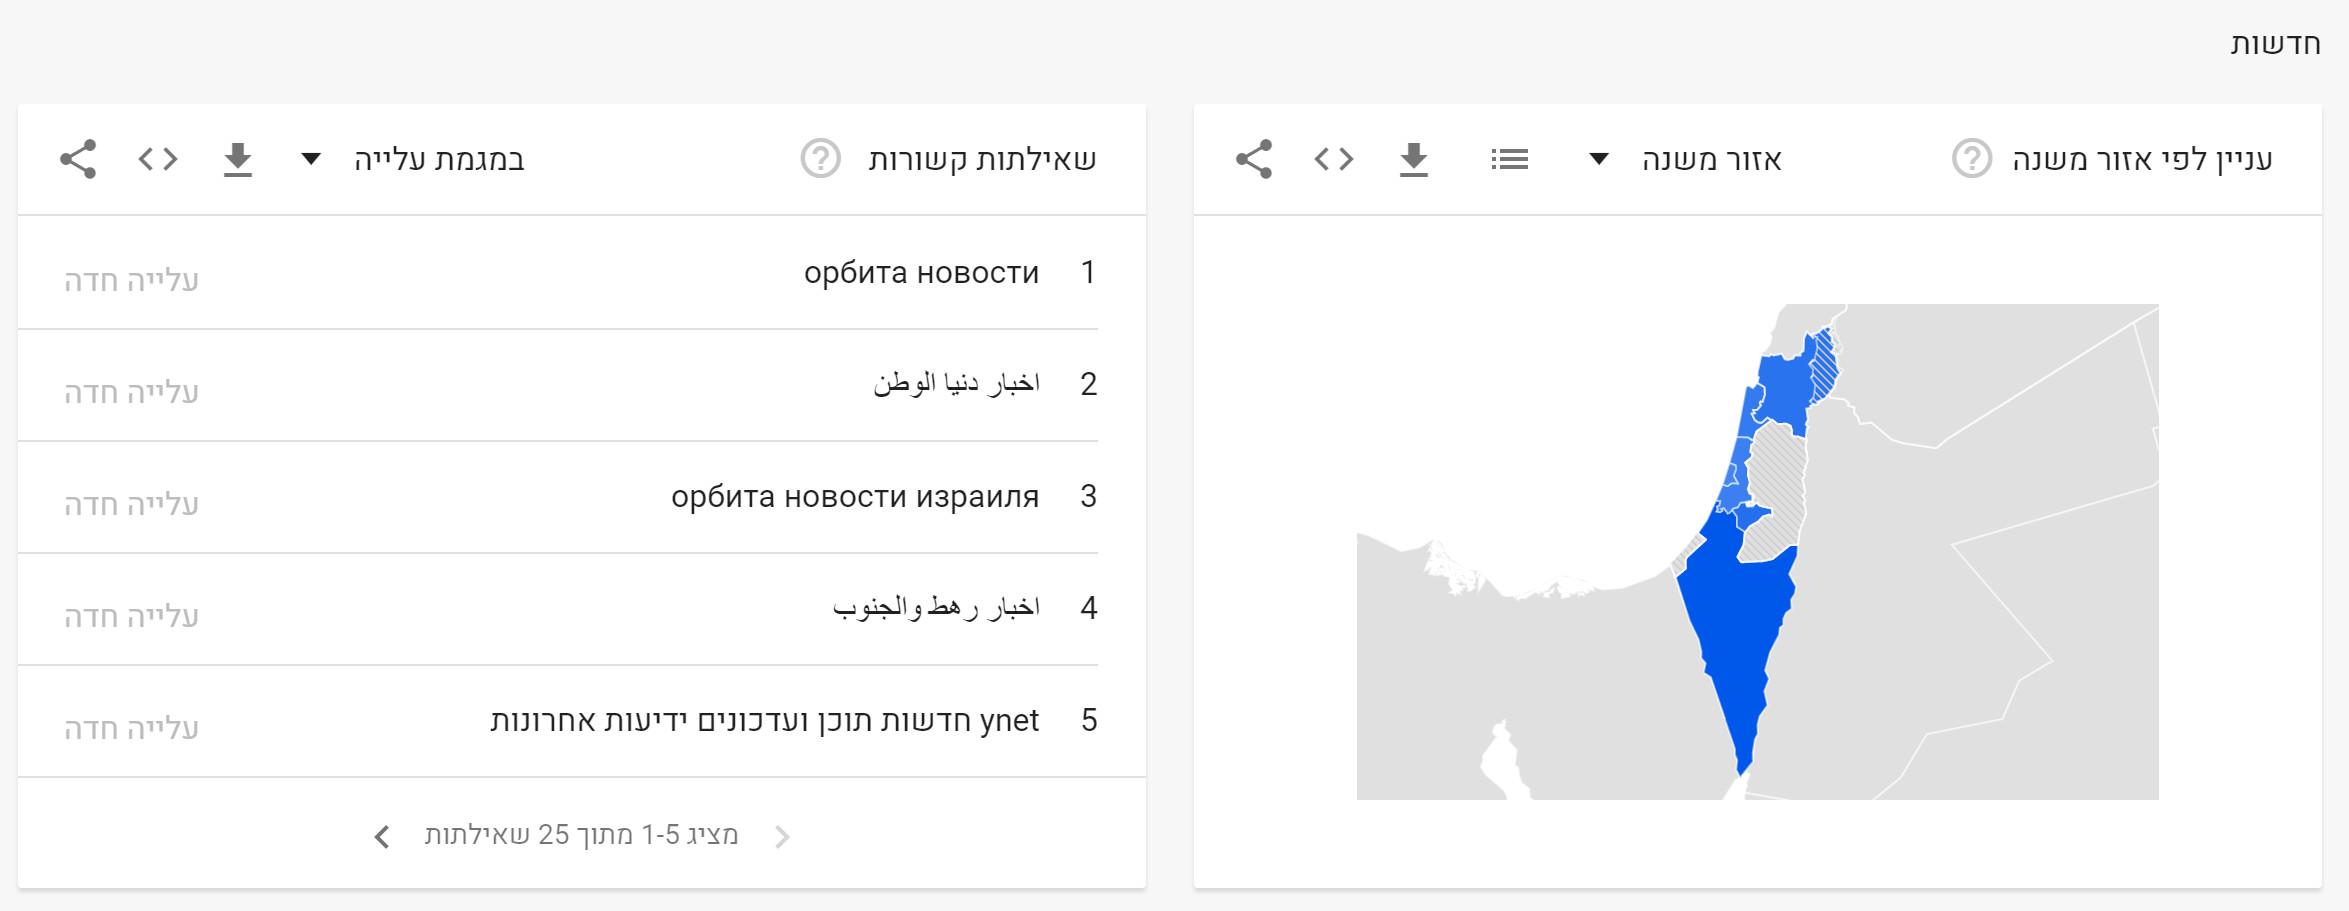 News in Google - Decade (2)